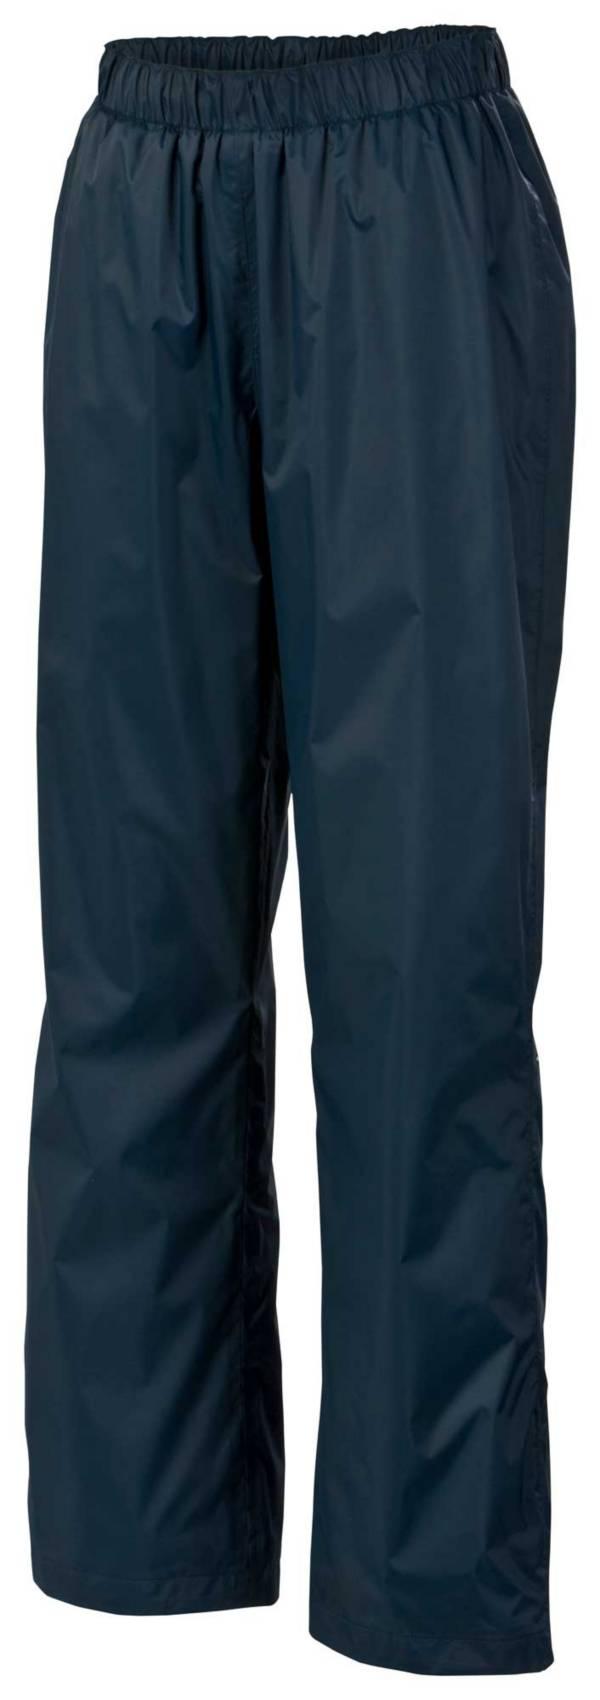 Columbia Women's Storm Surge Rain Pants product image